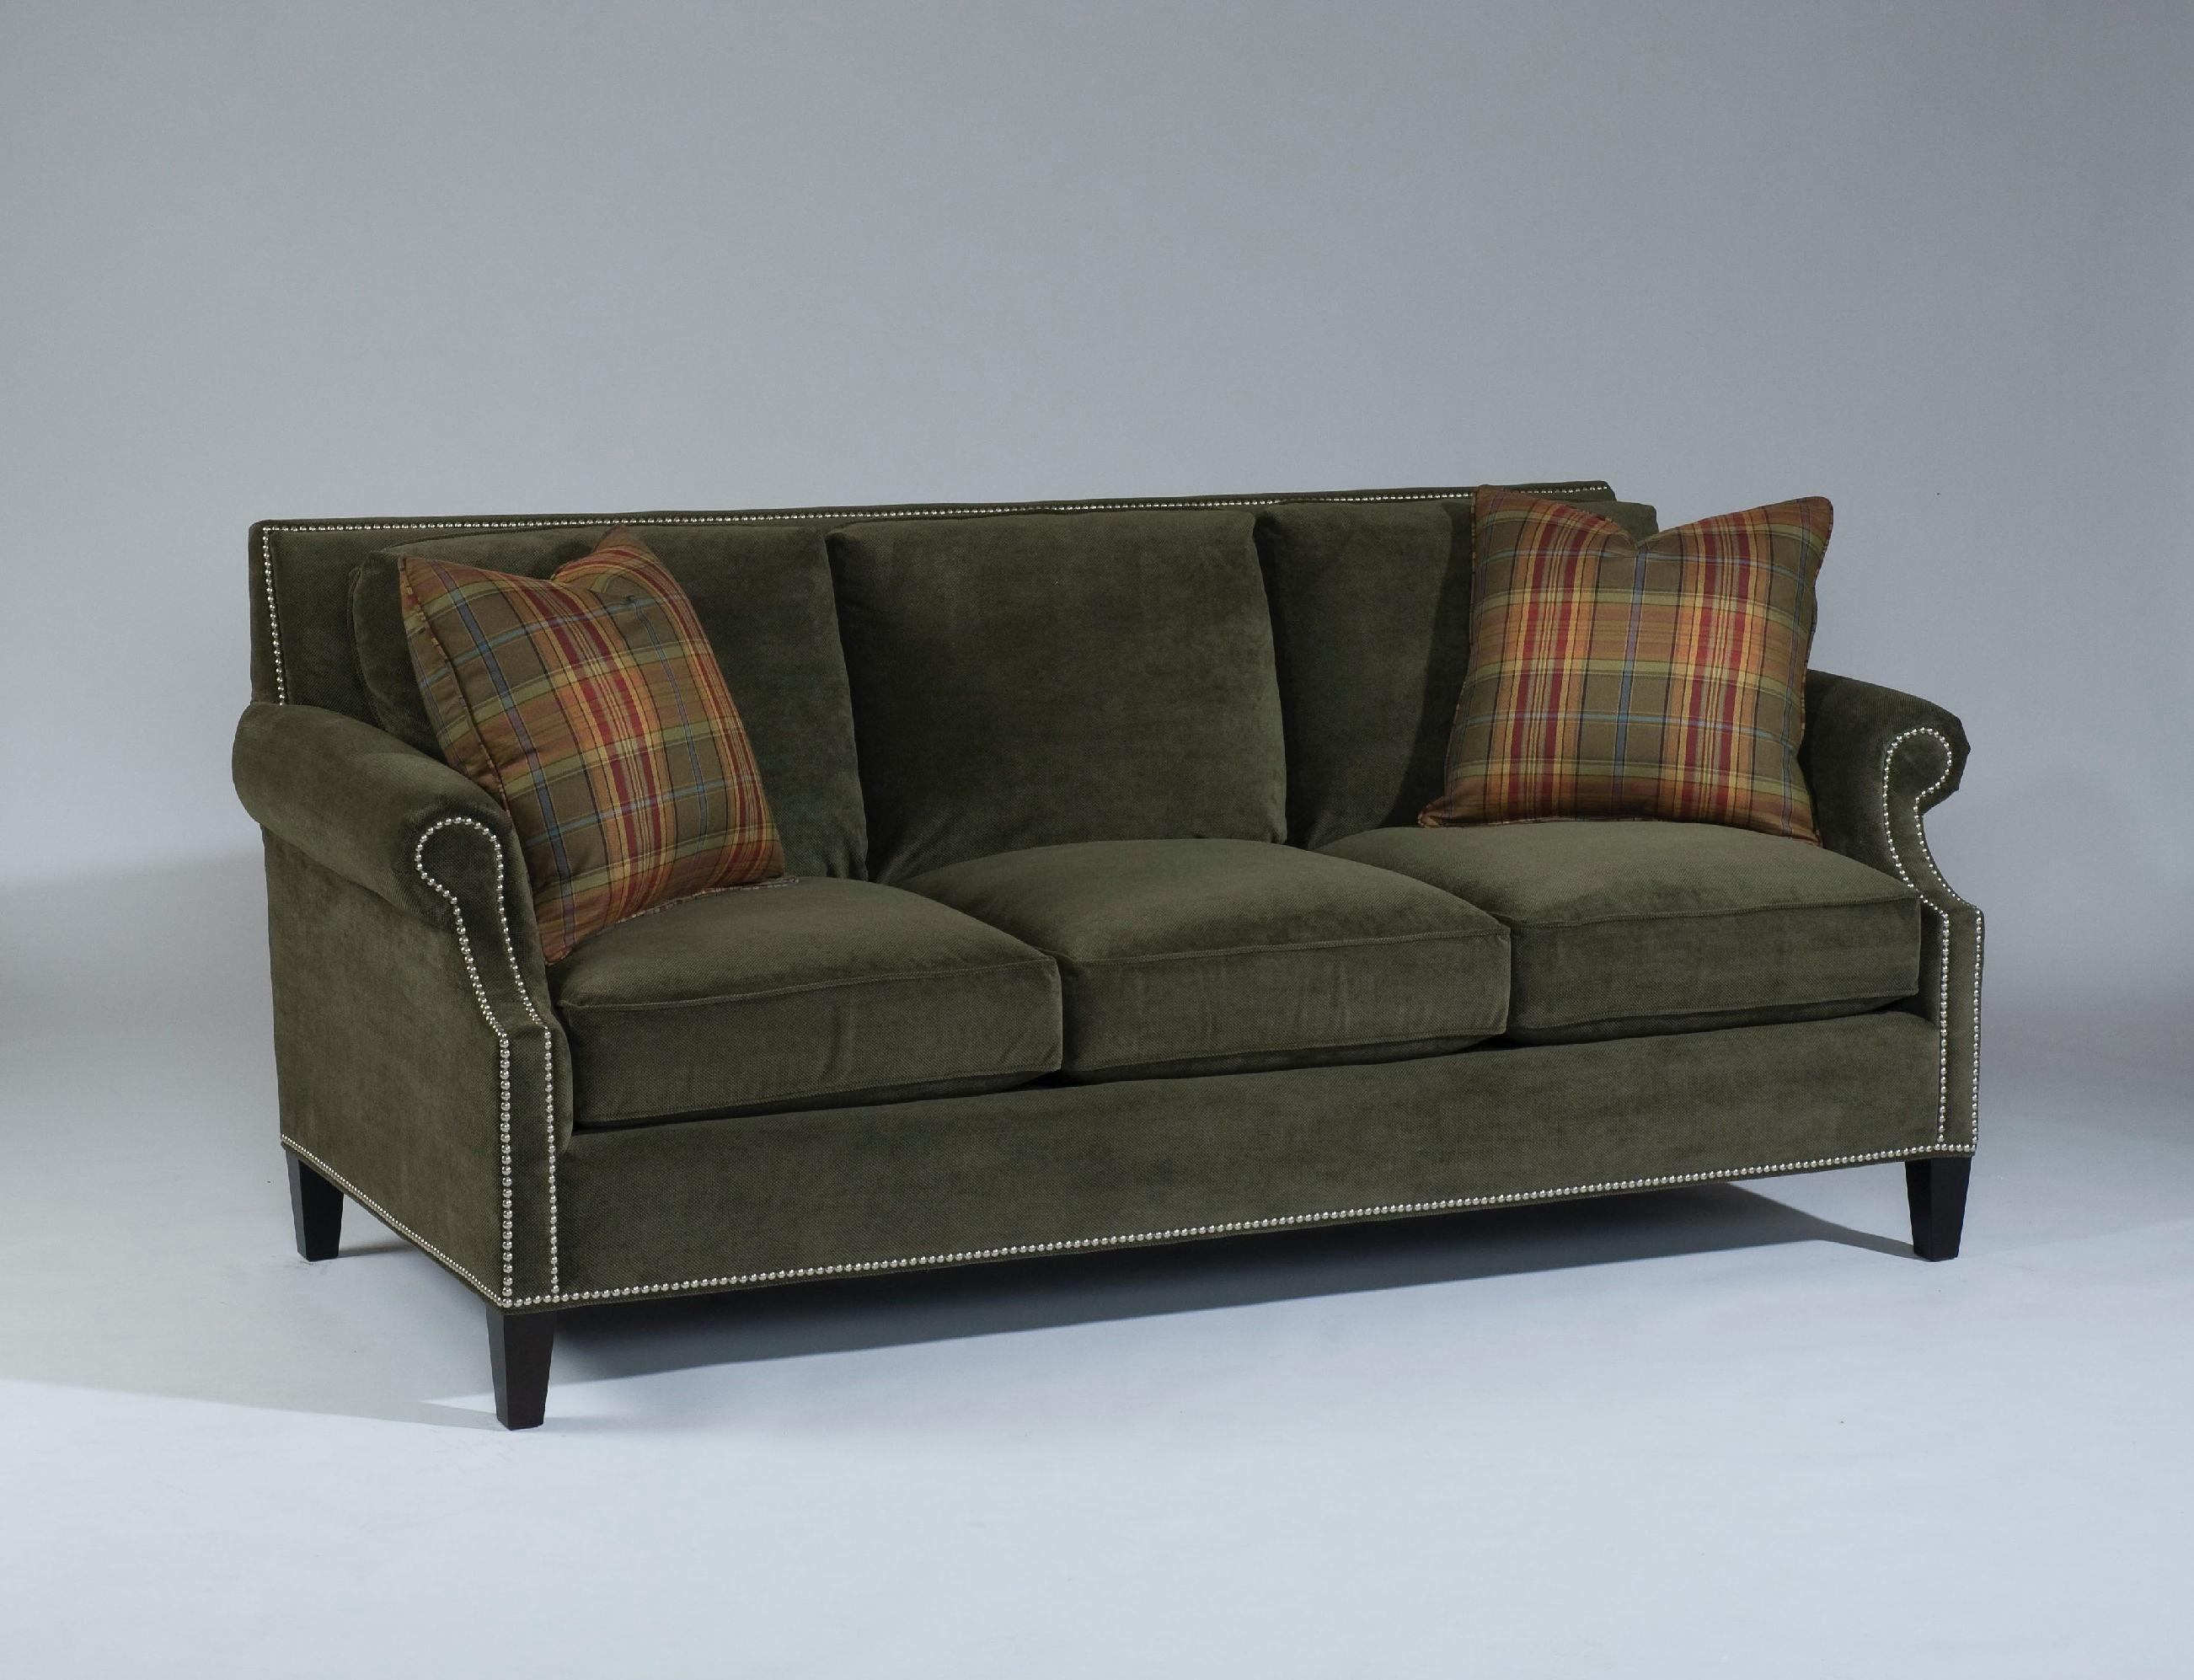 Superbe Southern Furniture Maria Sofa 2364